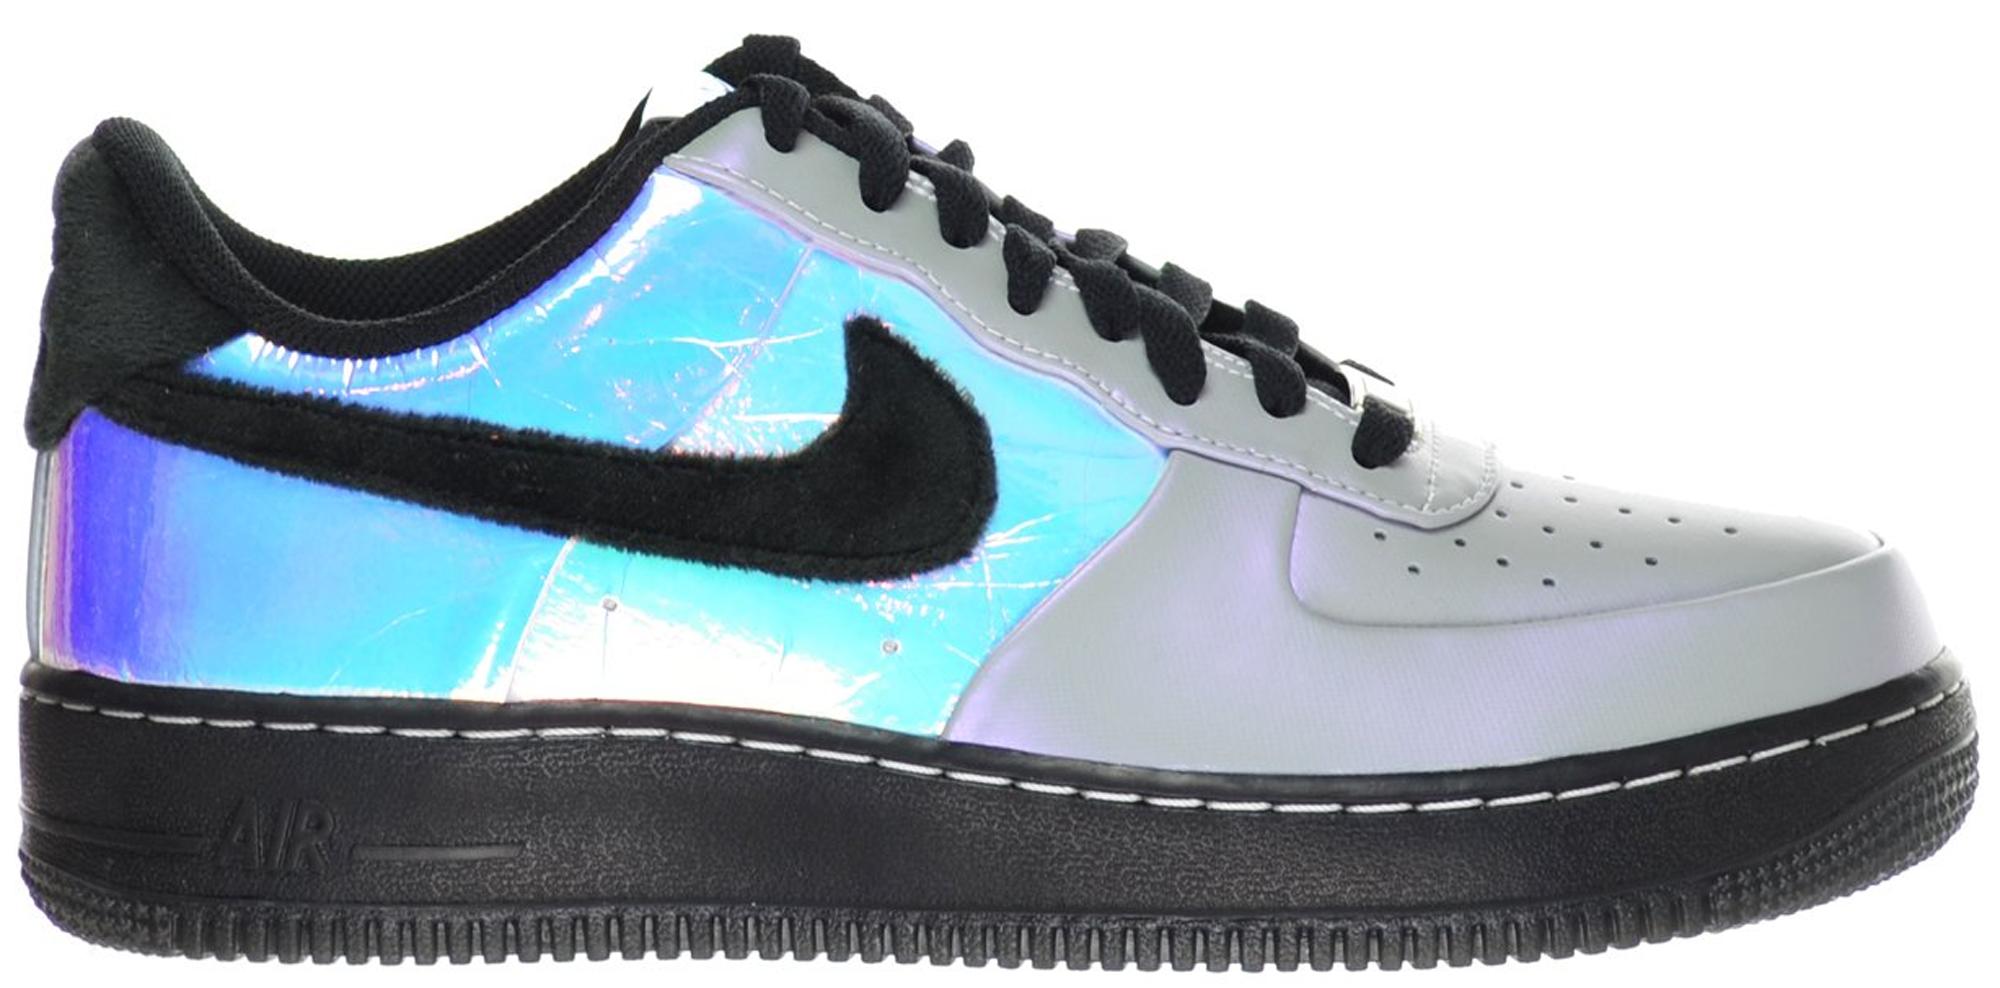 Nike Air Force 1 Low CMFT Hologram